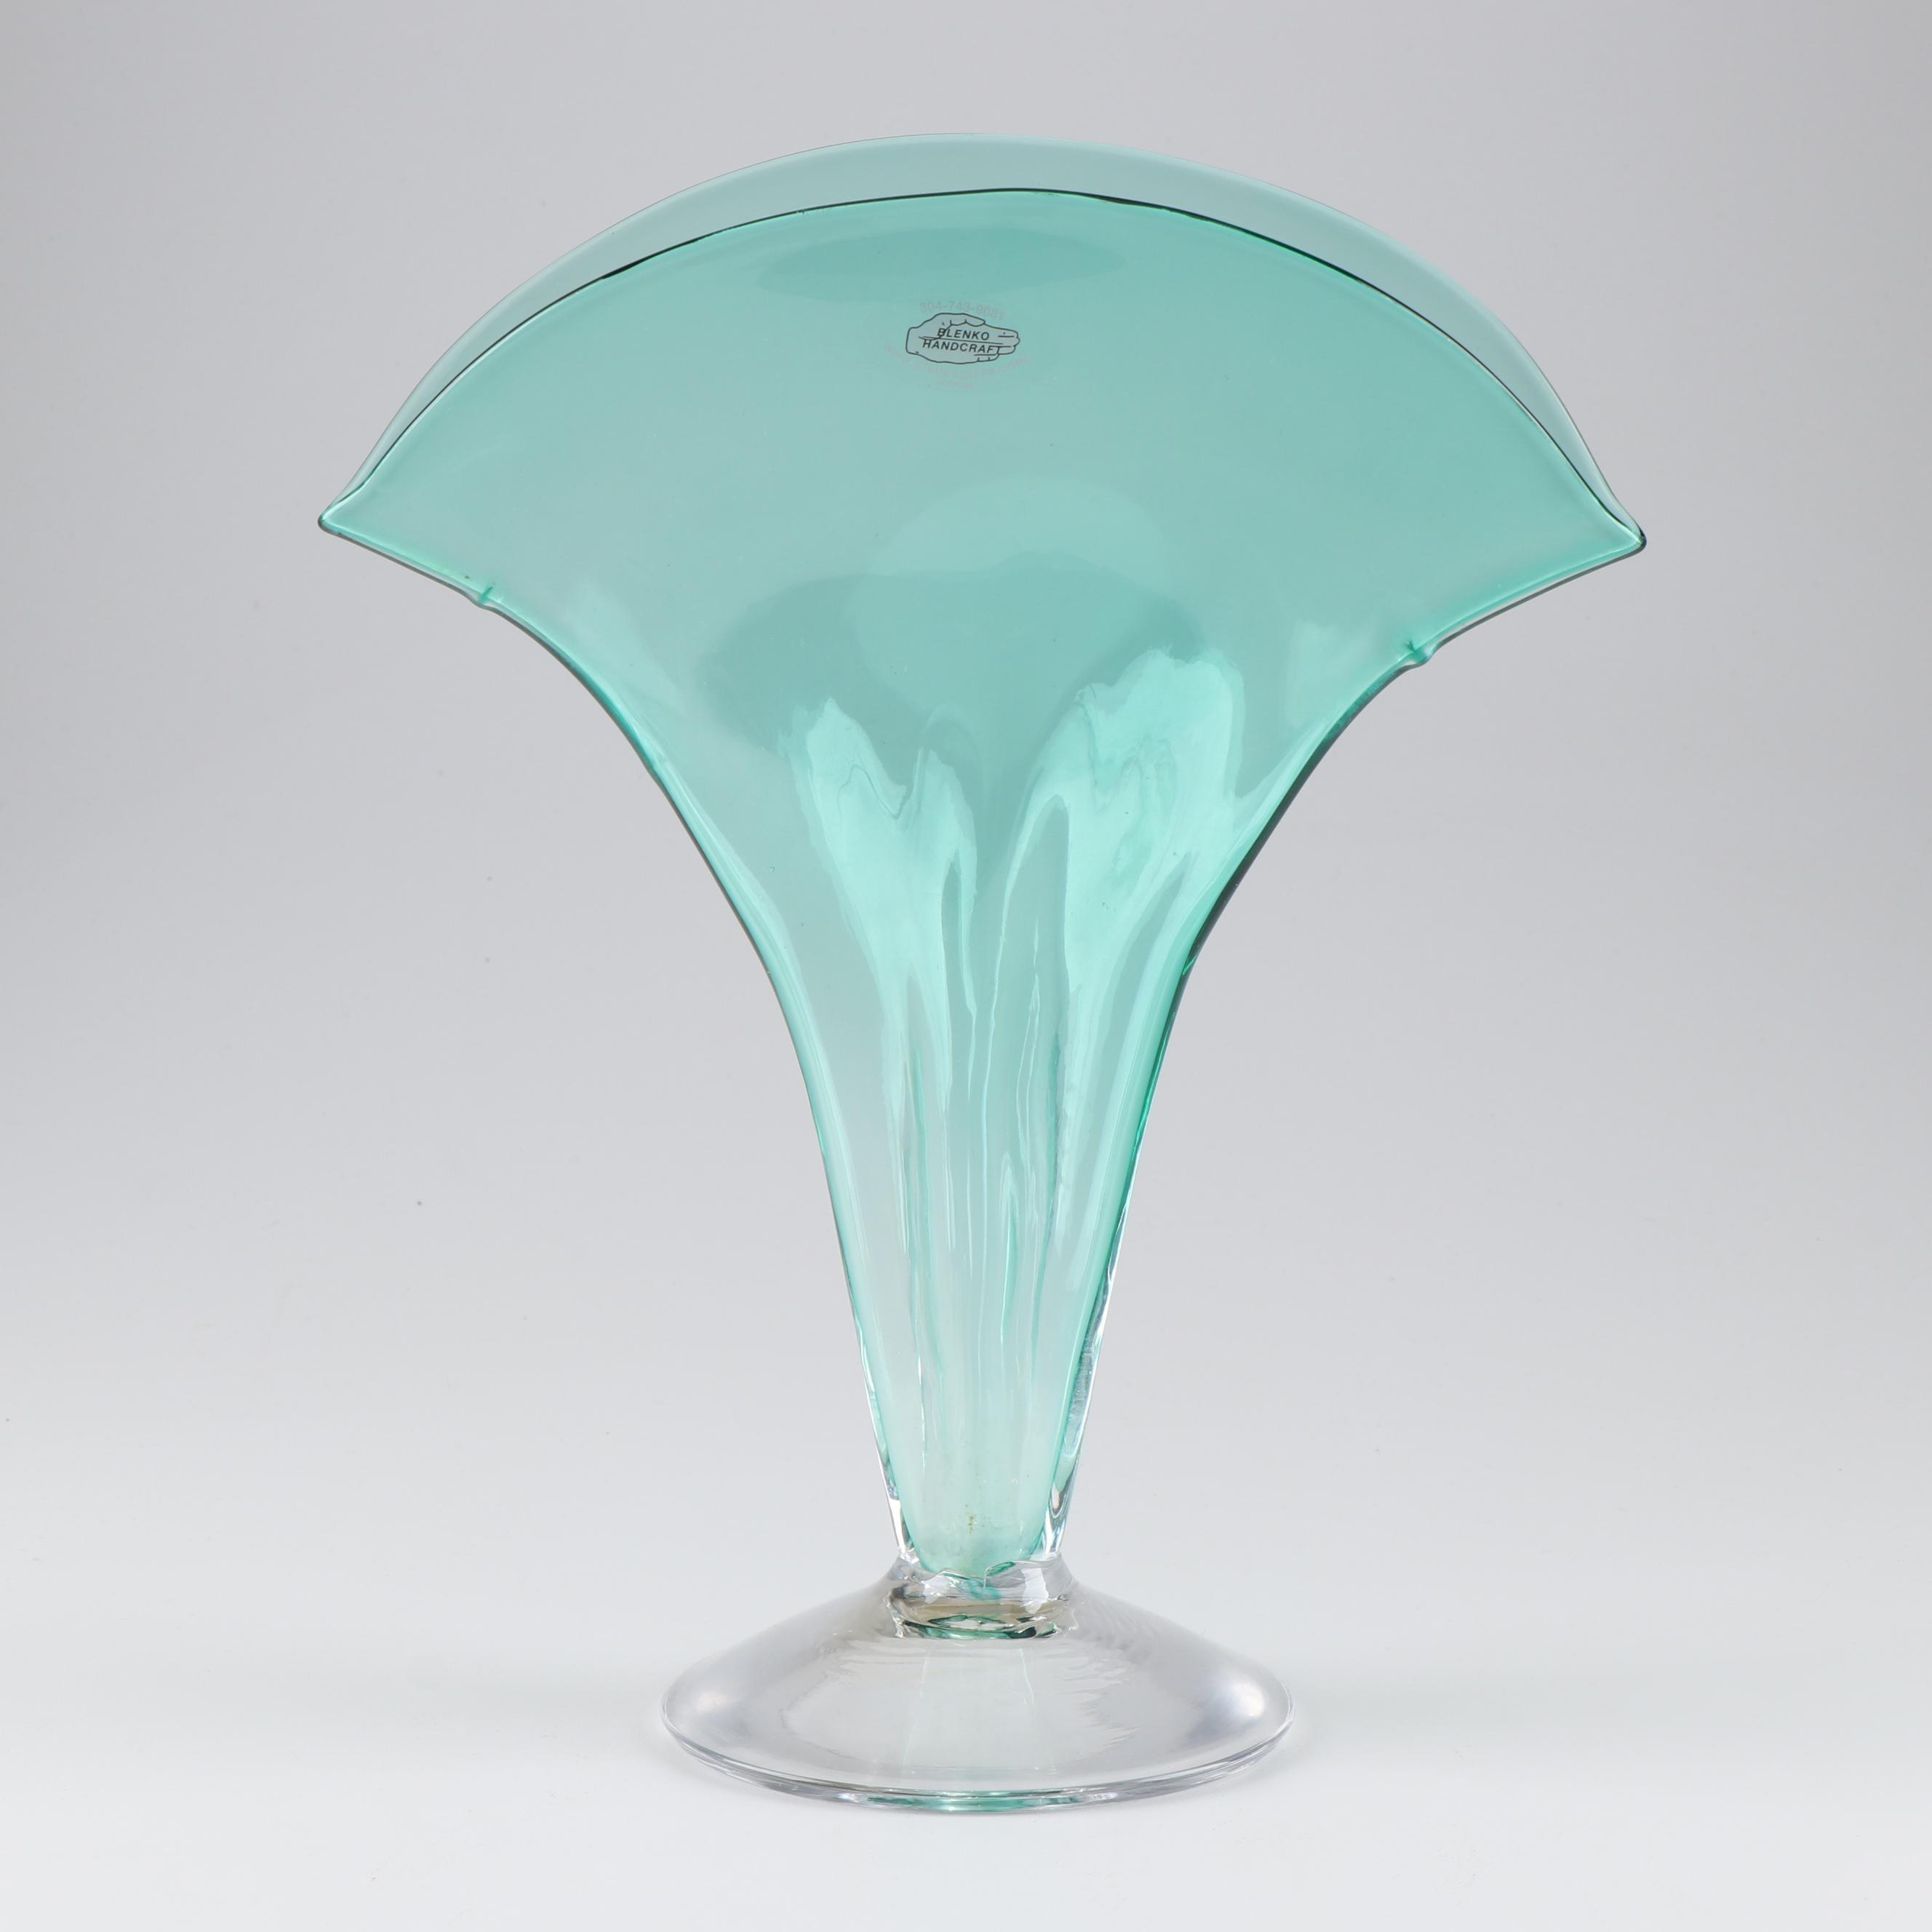 Blenko Handcraft Art Glass Fan Vase, Mid-Century